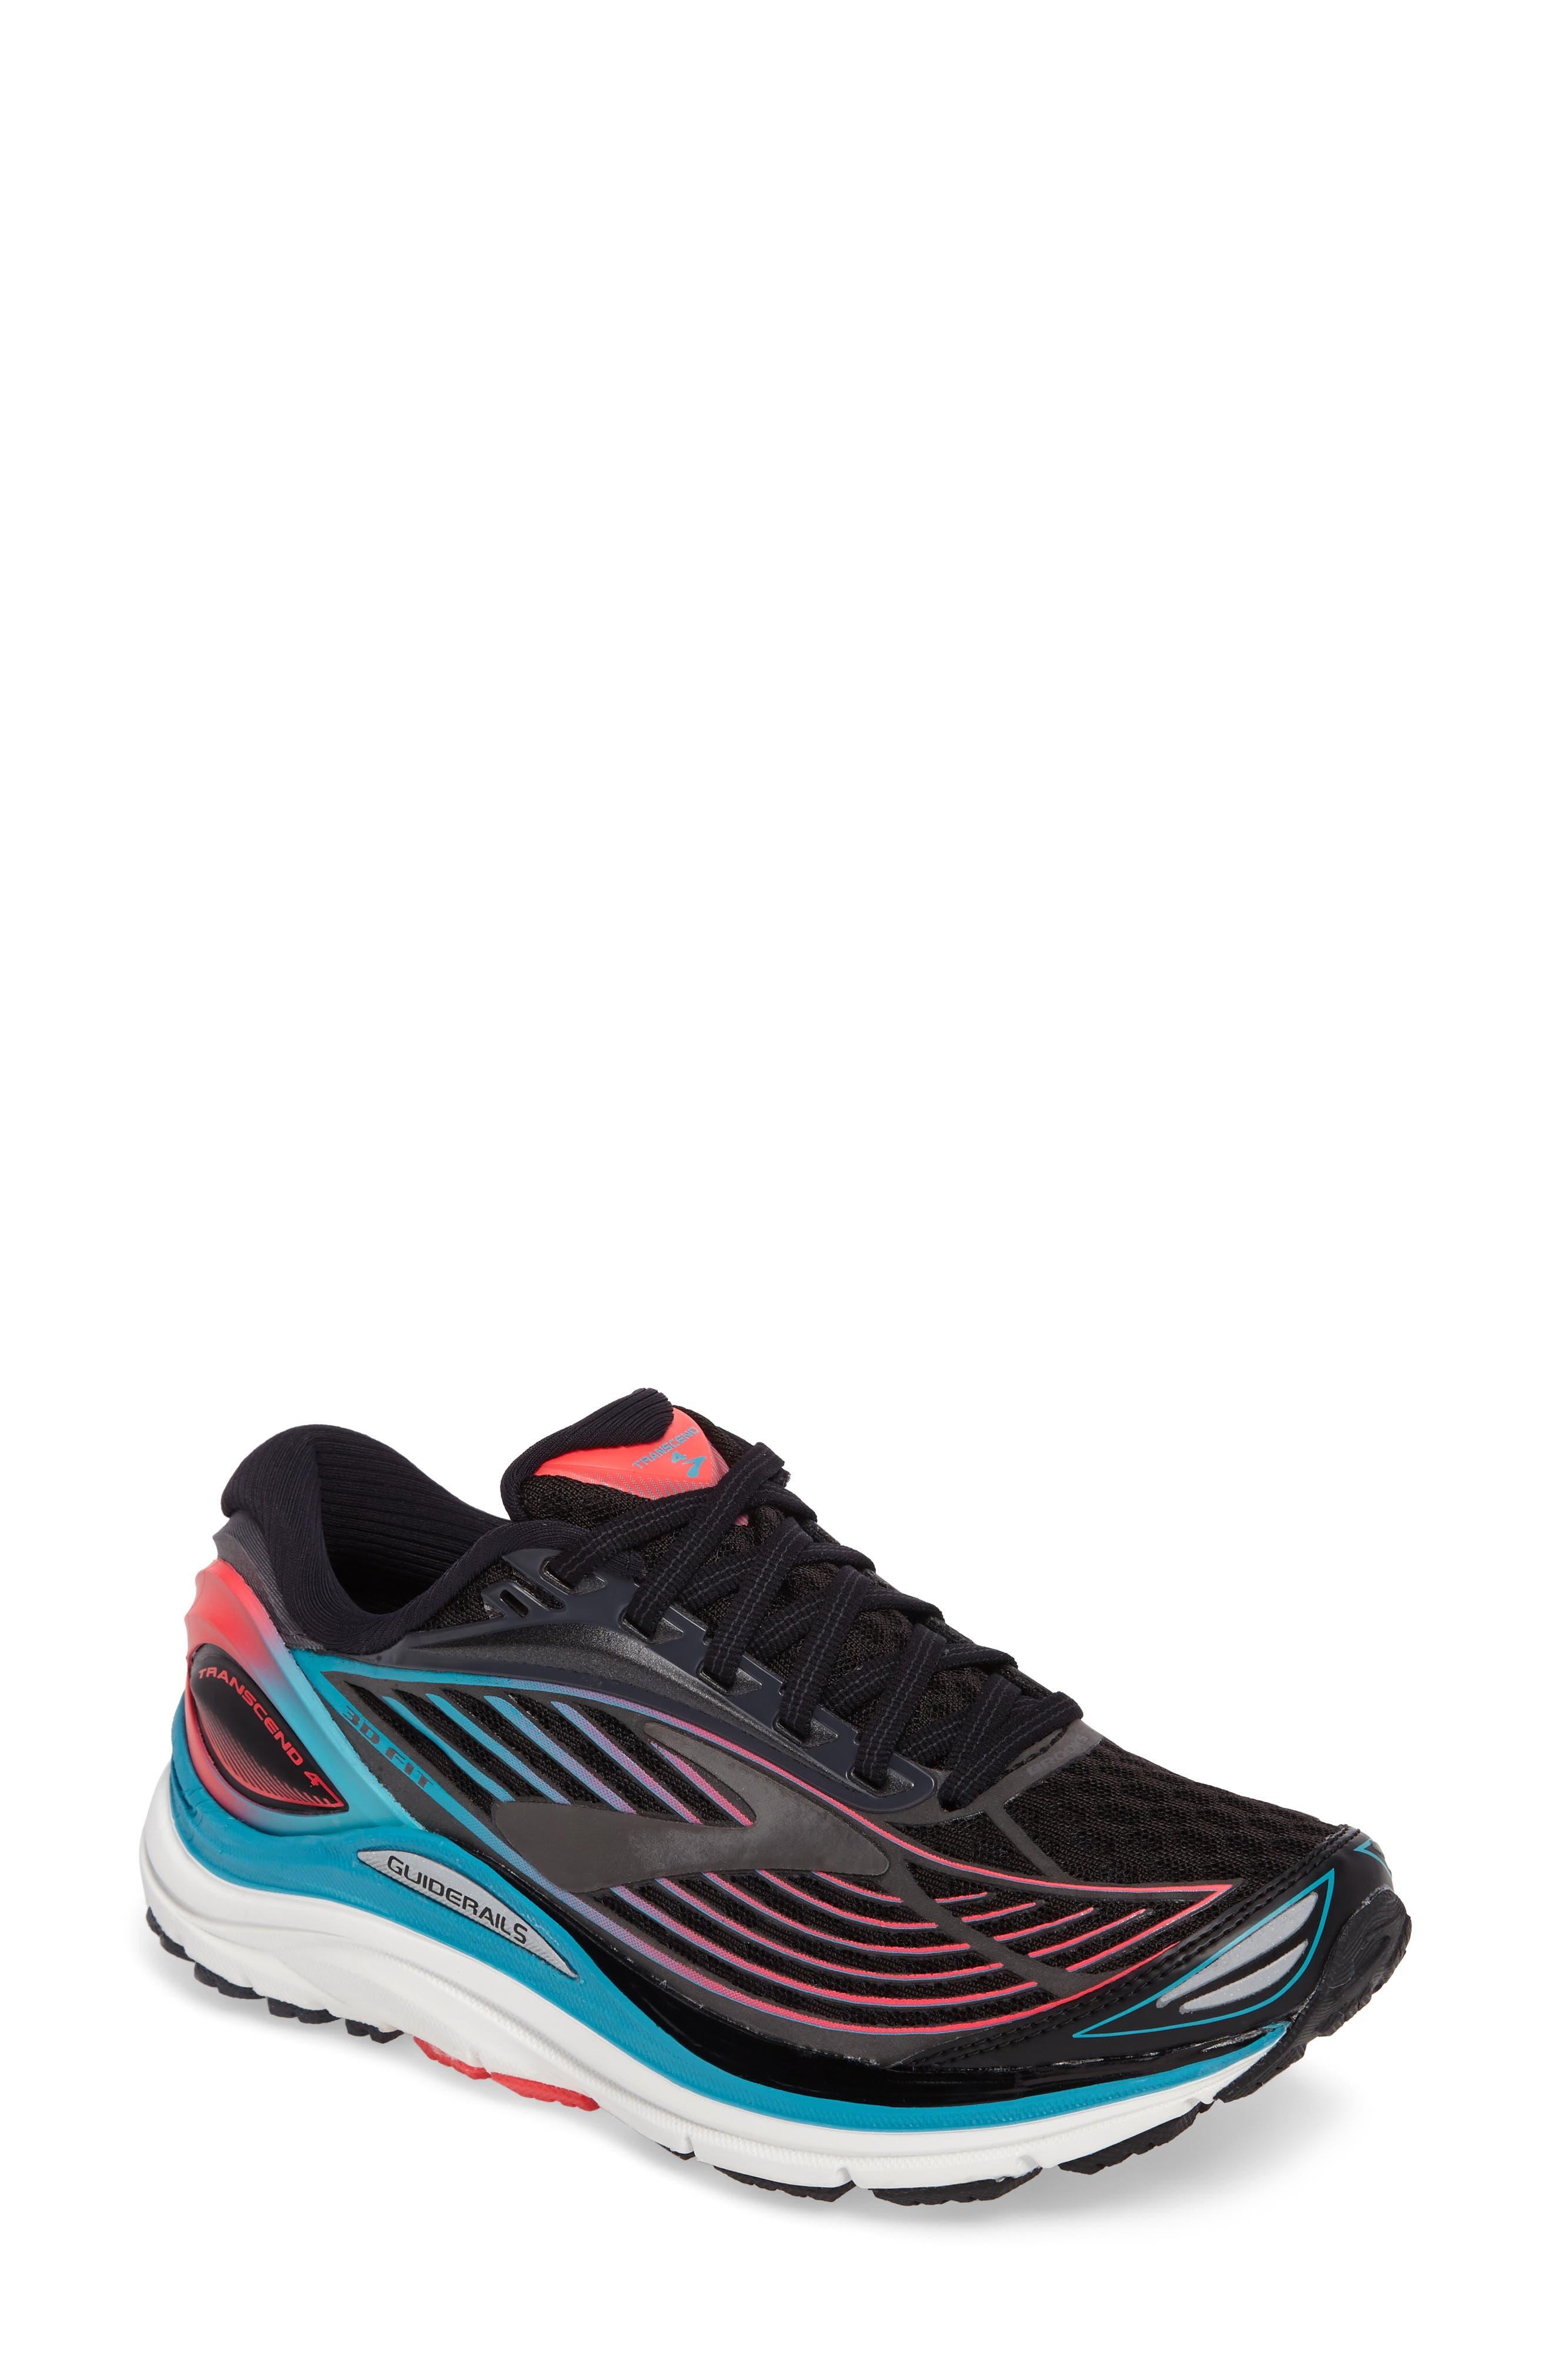 Main Image - Brooks Transcend 4 Running Shoe (Women)